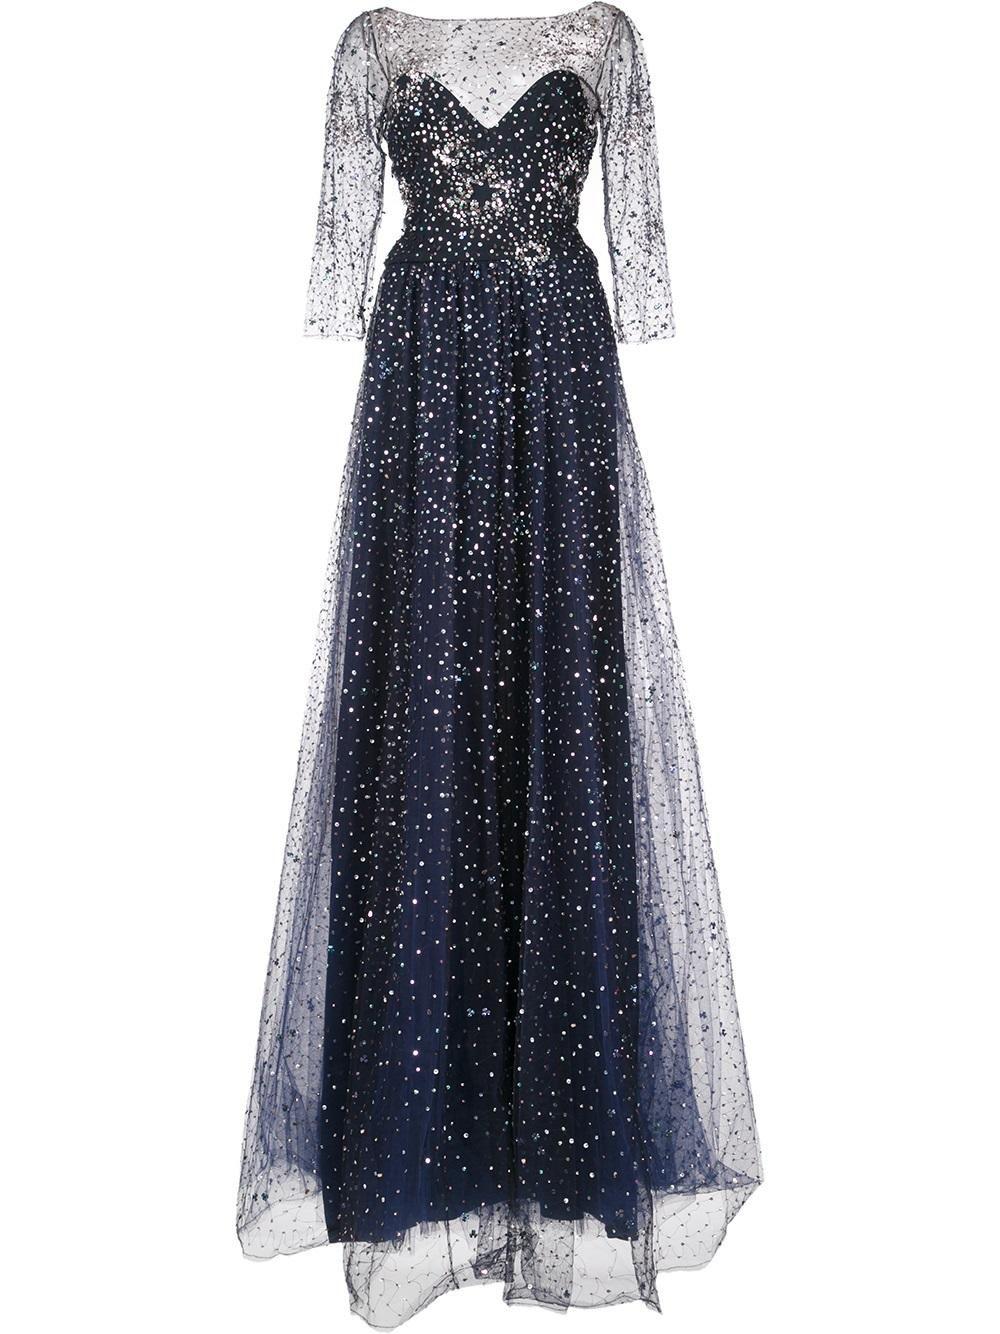 Marchesa Notte embellished gown | Гардероб | Pinterest | Marchesa ...